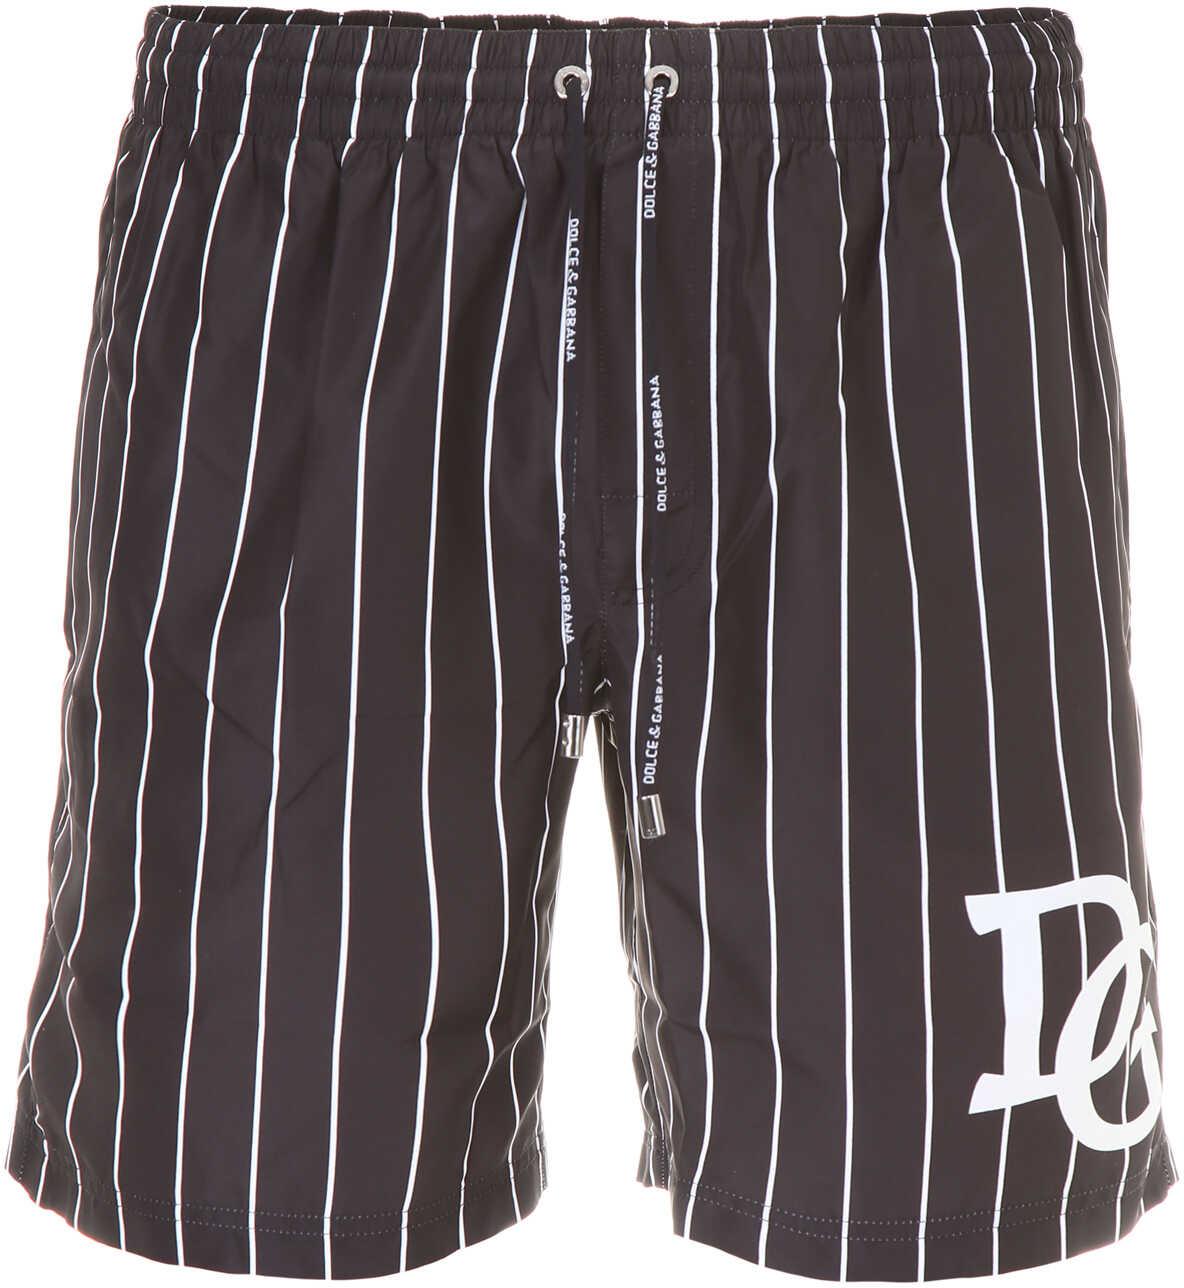 Dolce & Gabbana Swim Shorts RIGA BCA FDO NERO